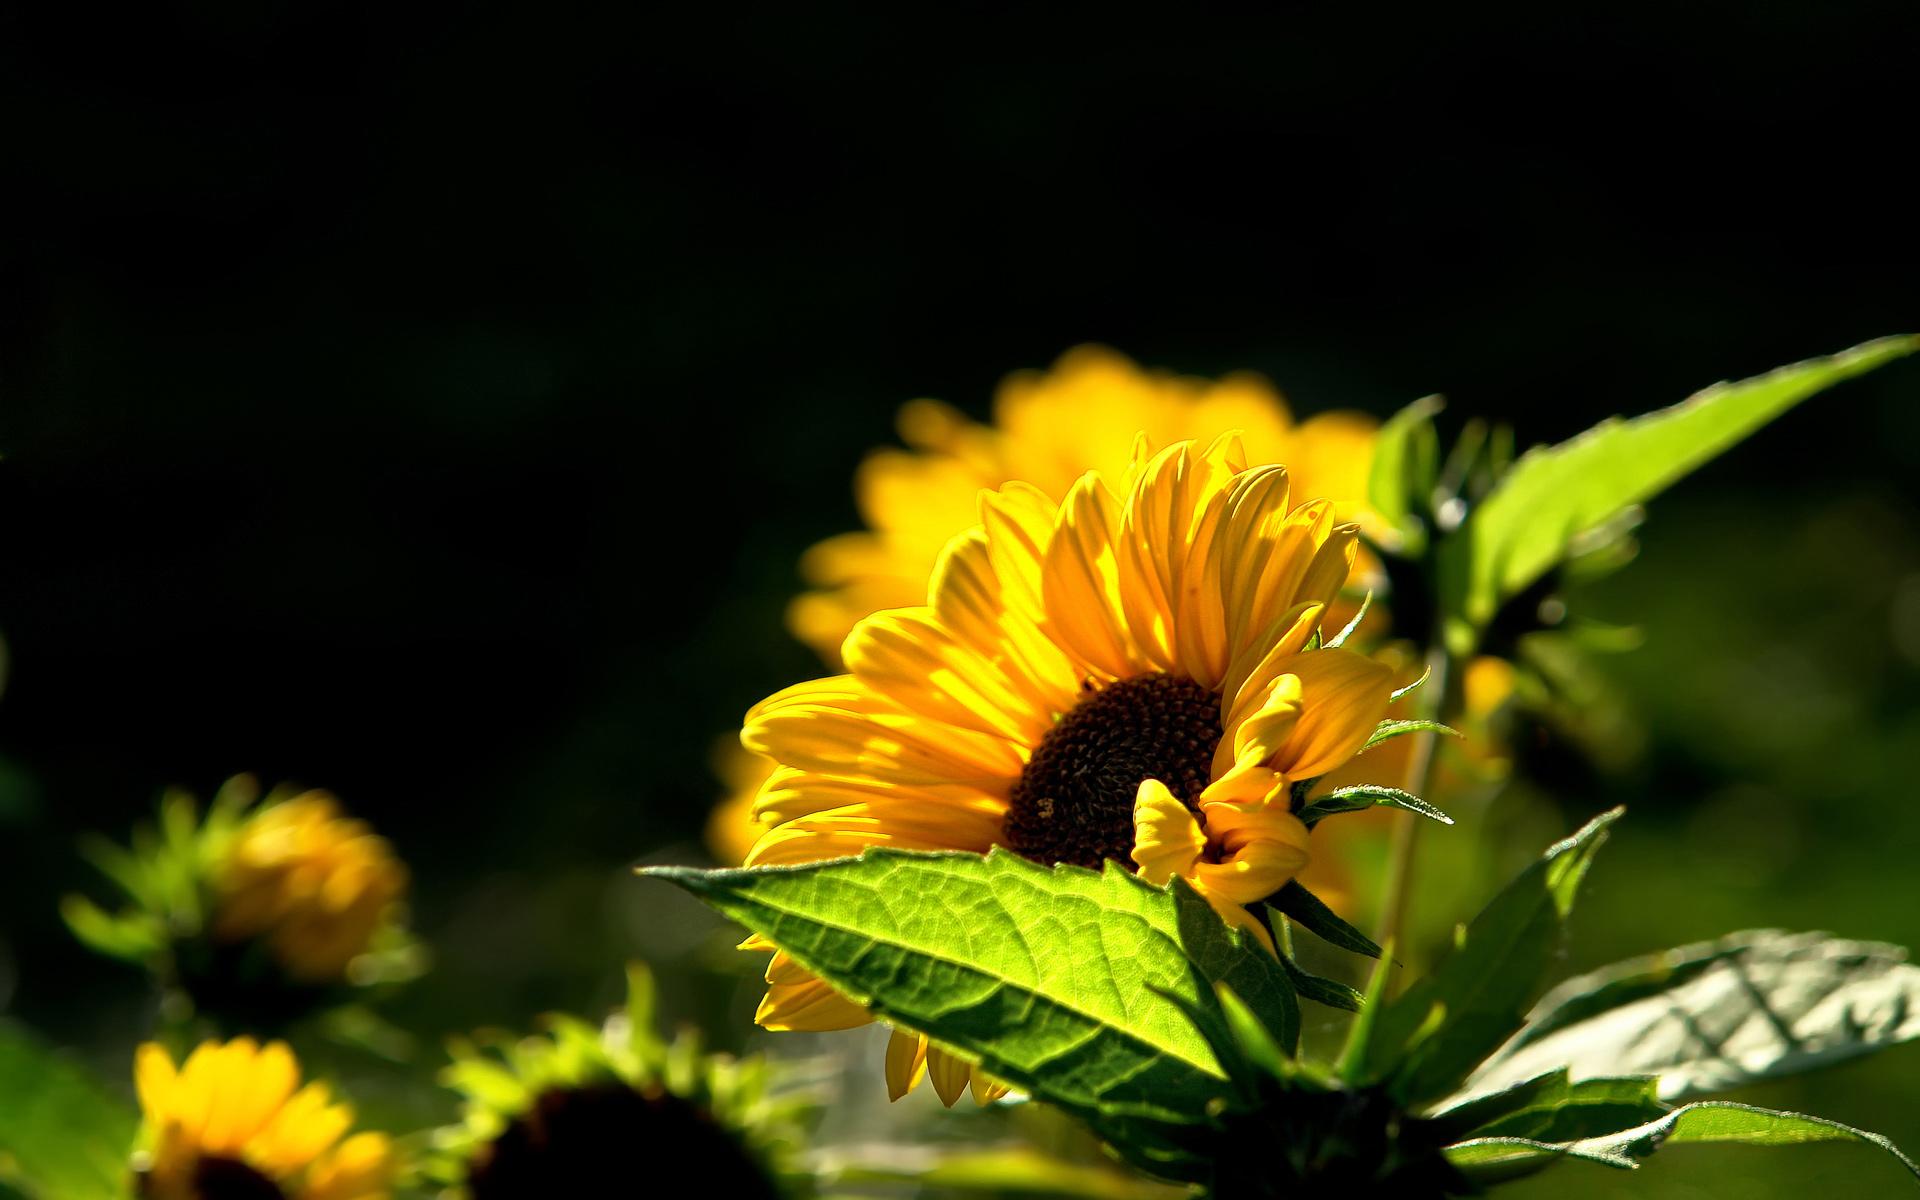 Hd wallpaper yellow flowers - Yellow Flower Wallpapers Hd Wallpapers Yellow Flower Wallpapers